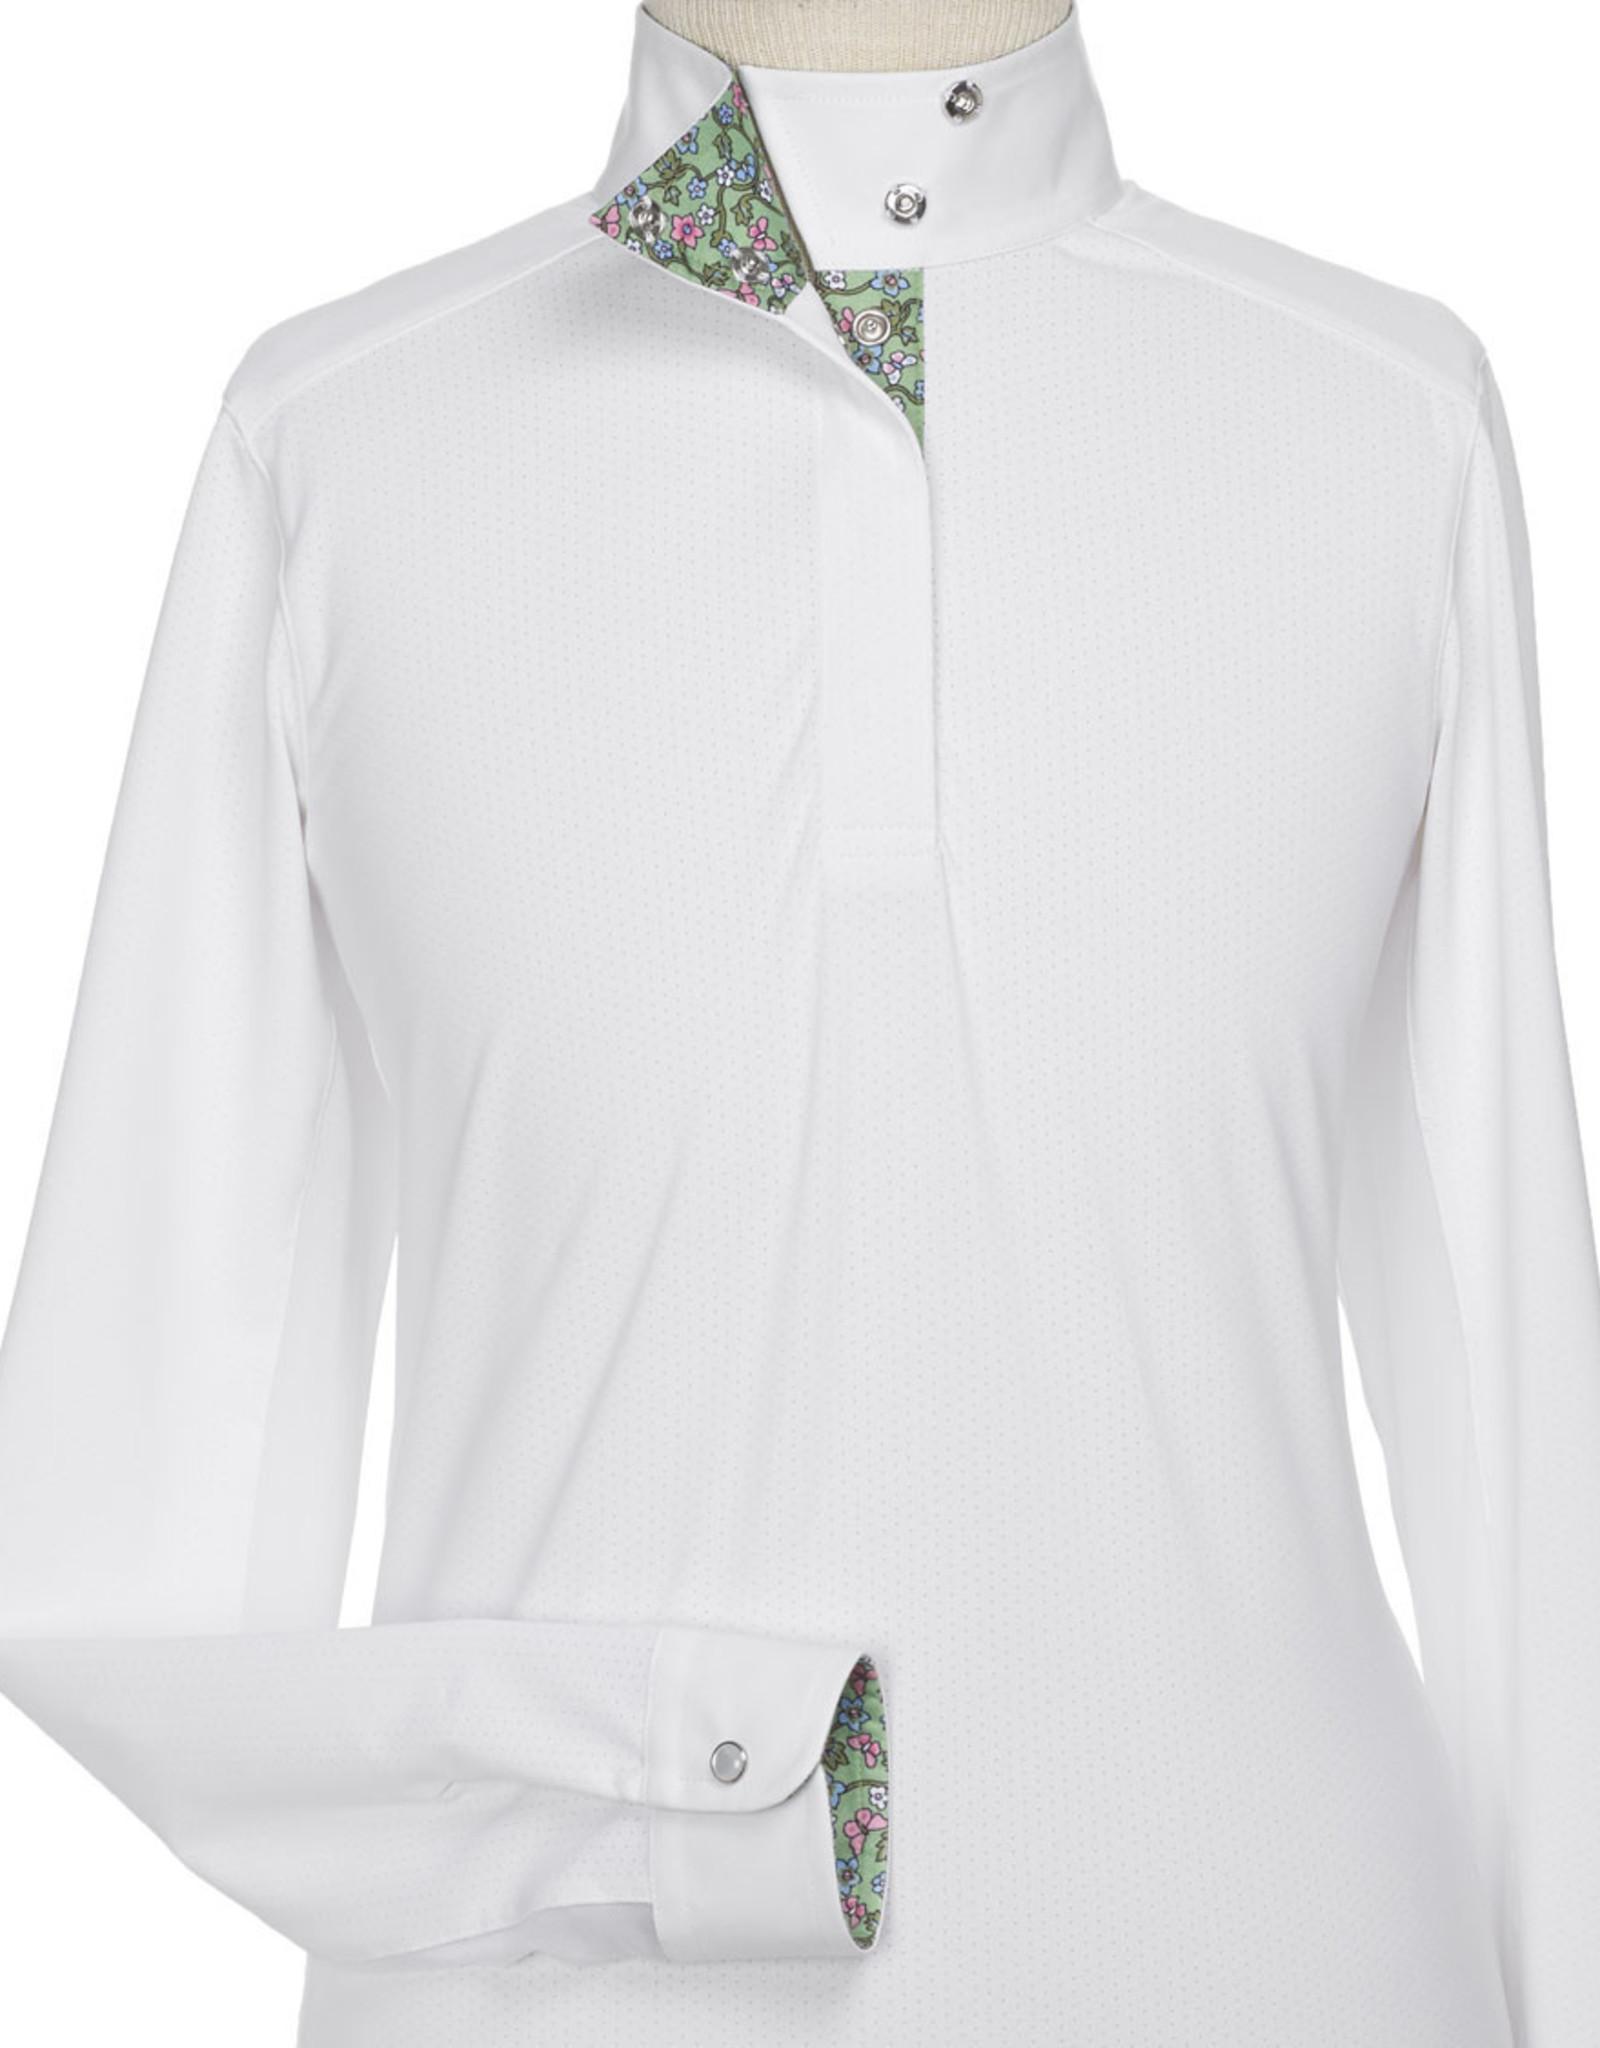 "Essex Beacon Hill Girls Talent Yarn ""Mariposa"" Wrap Collar Show Shirt"